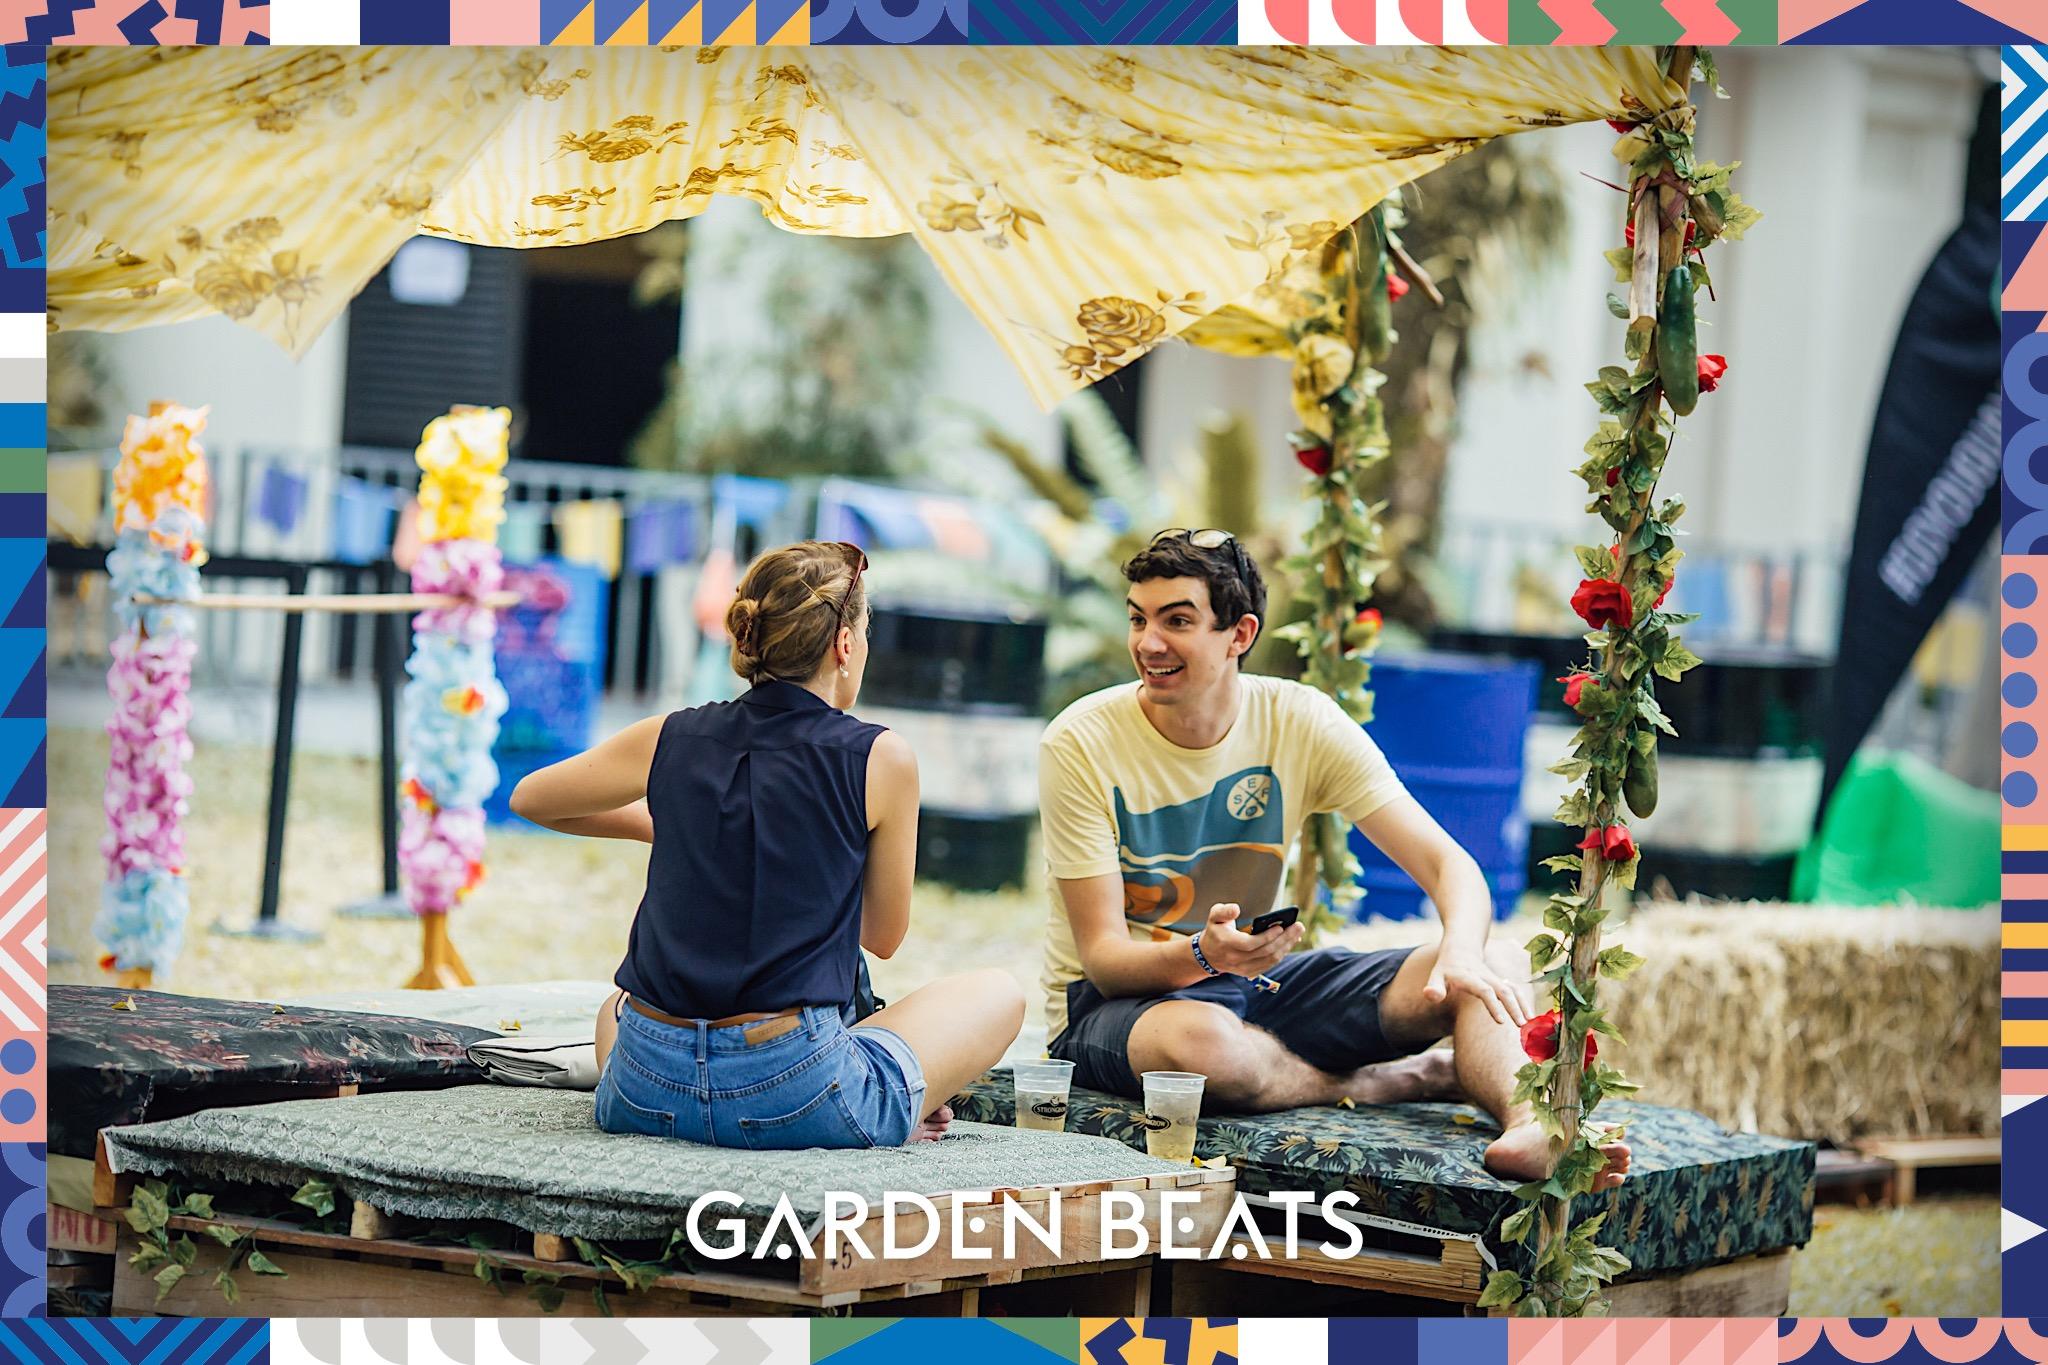 18032017_GardenBeats_Colossal147_WatermarkedGB.jpg